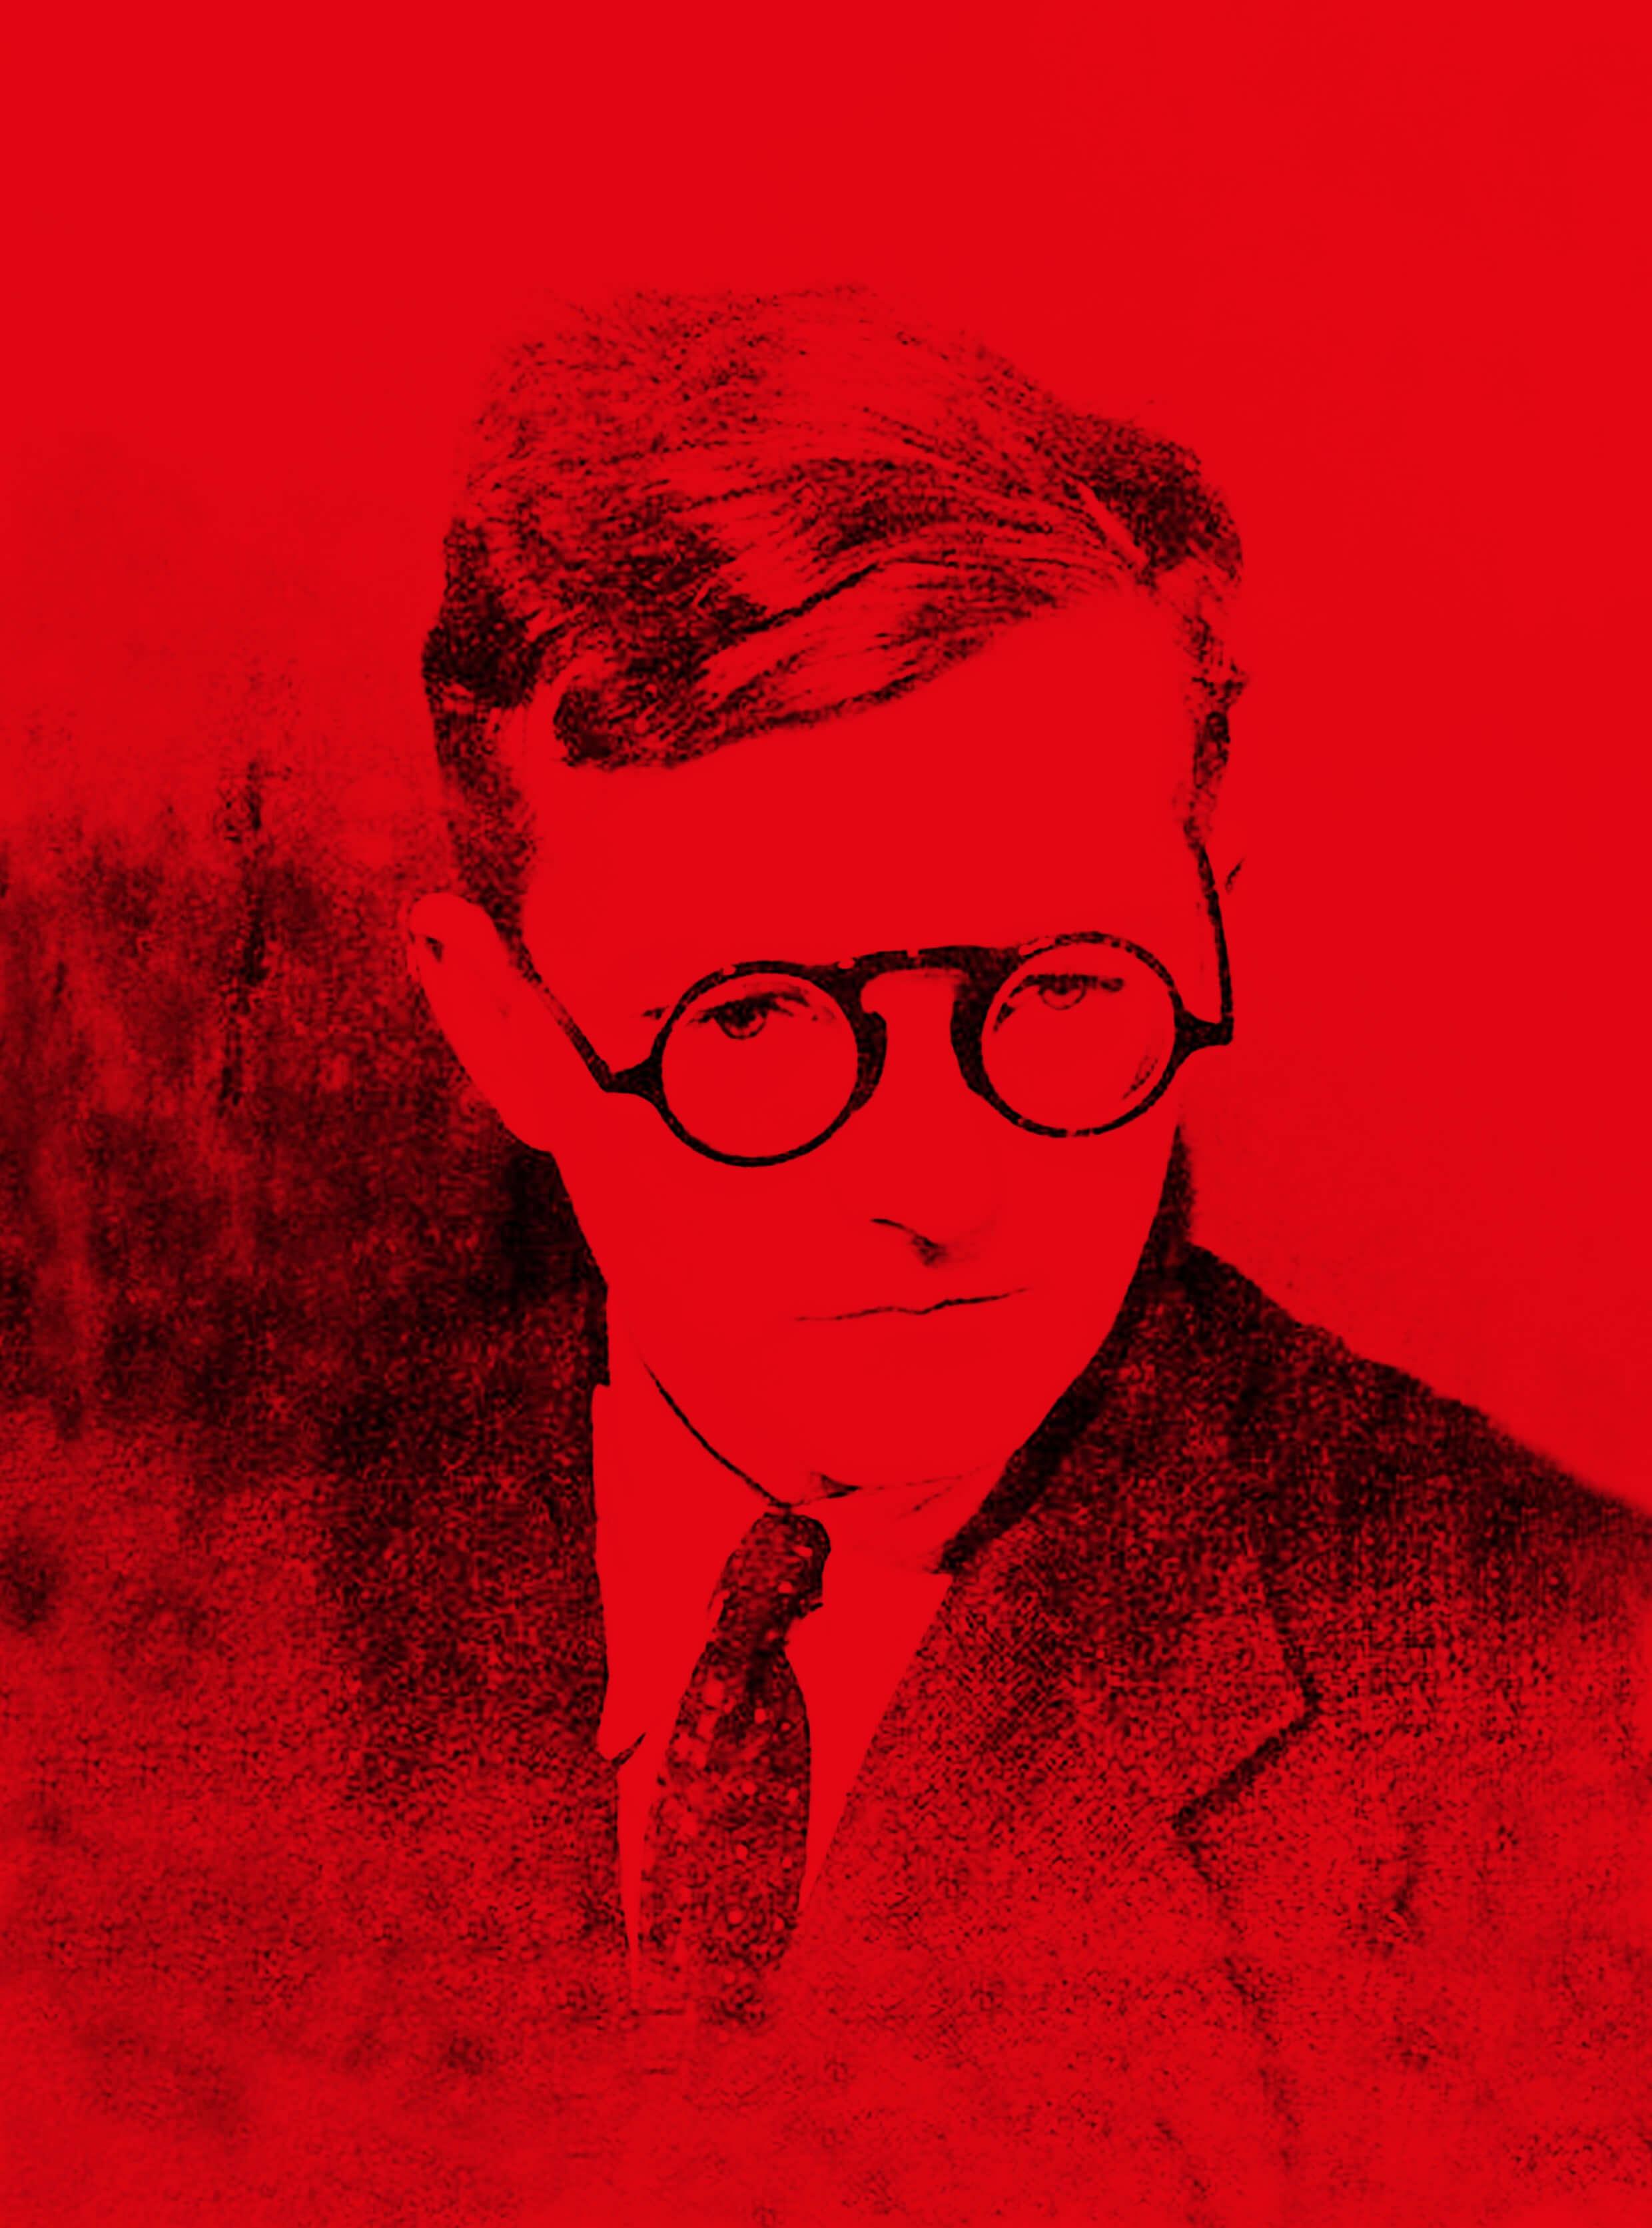 Philharmonie Zuidnederland: Sjostakovitsj versus Stalin